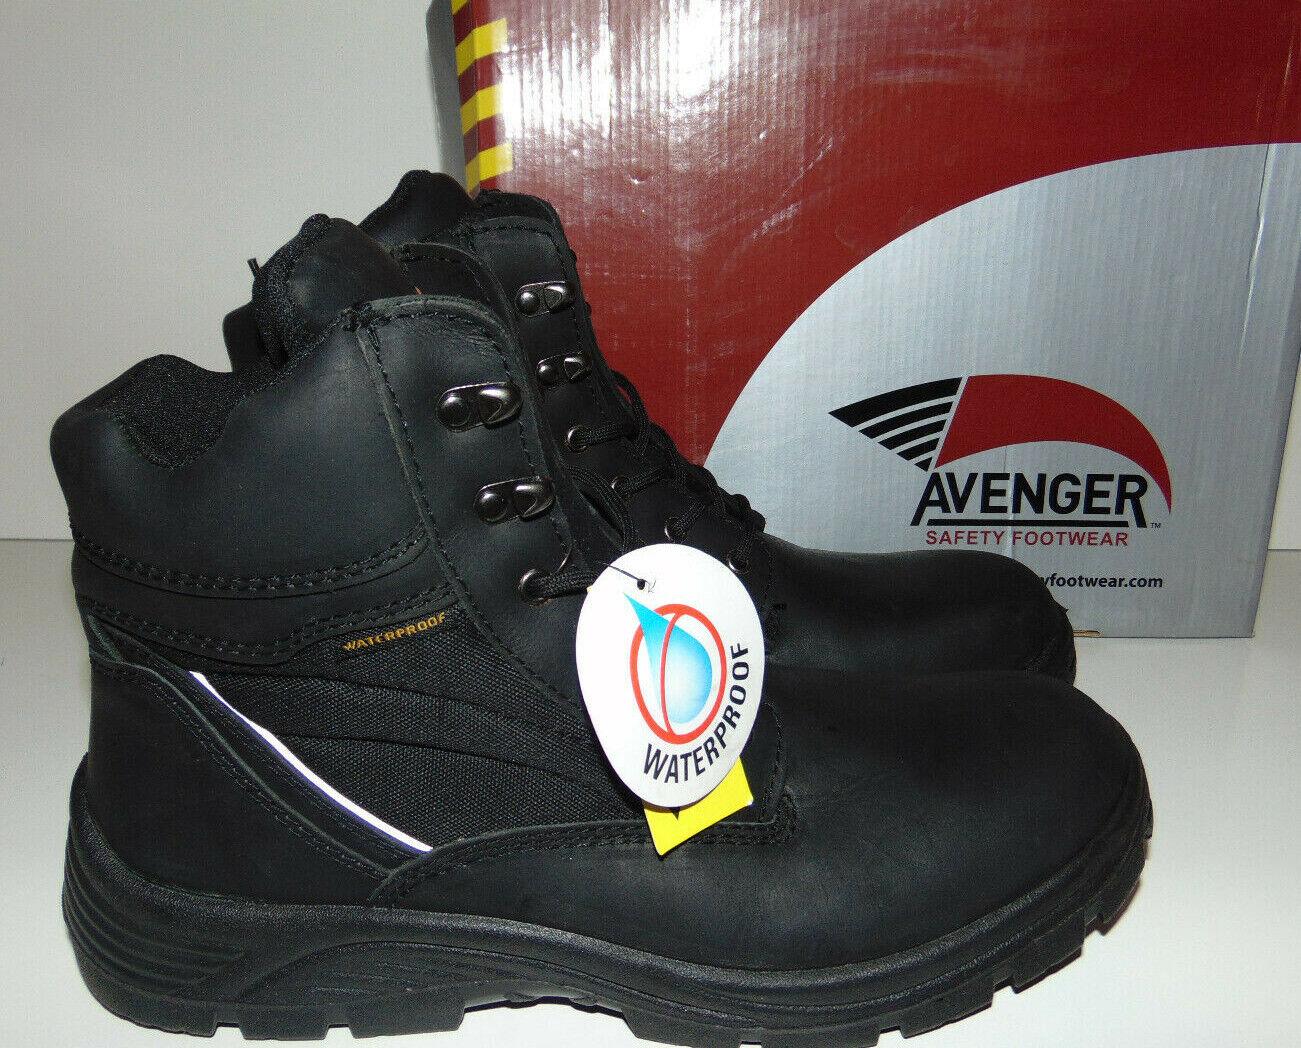 Avenger Men's Waterproof Lace-Up EH Work Boot Sz 11.5 W WIDE